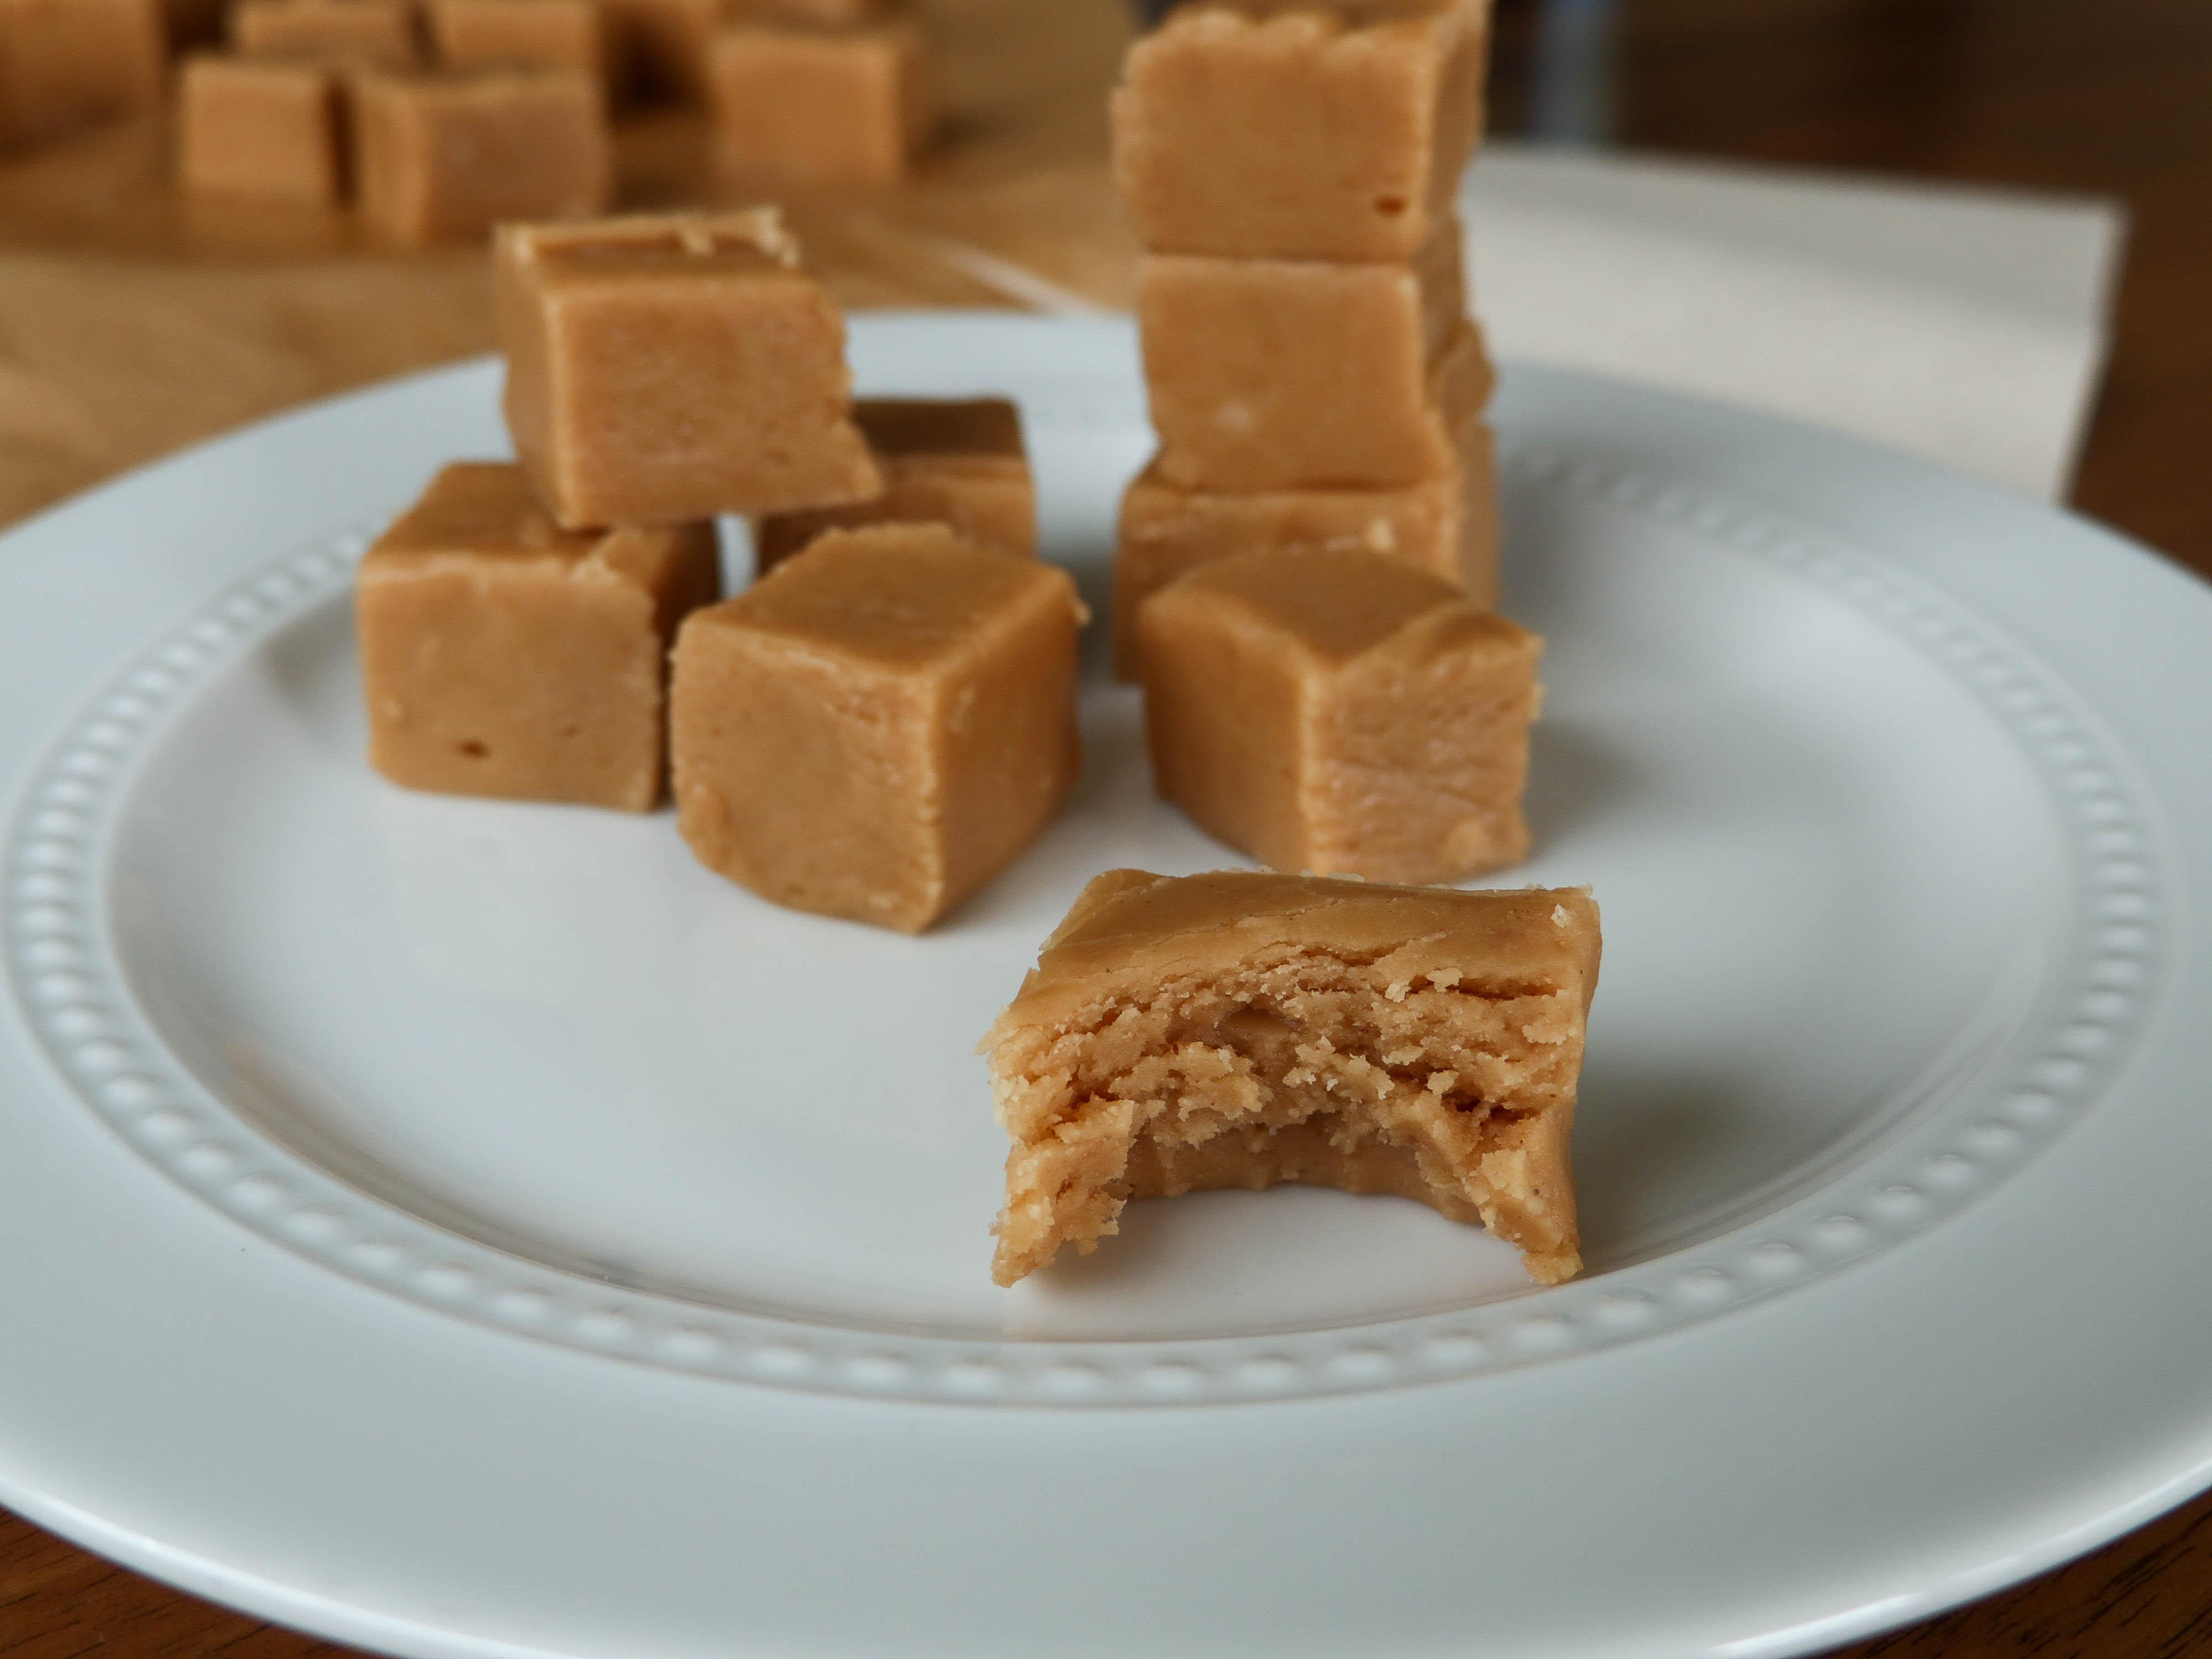 Creamy Cannabis Peanut Butter Squares